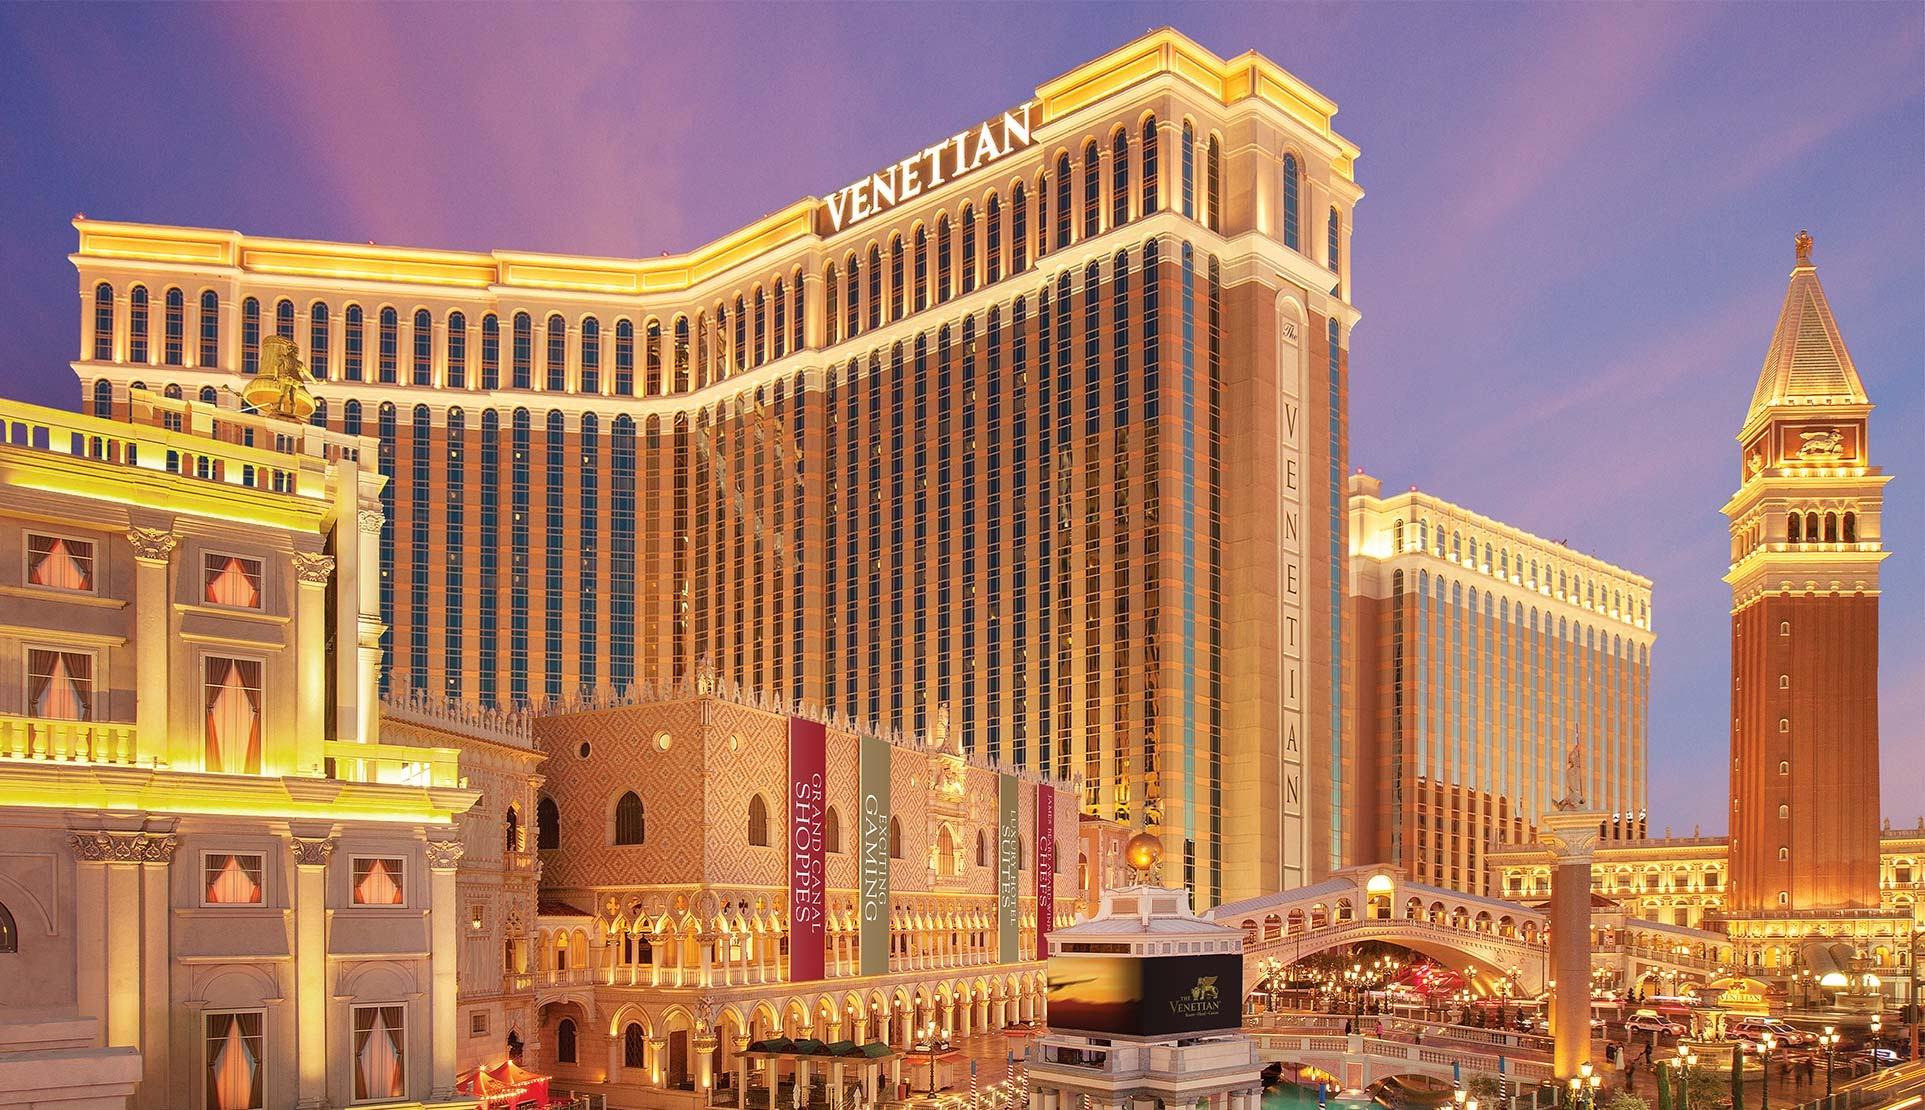 The Venetian | CasinoCyclopedia | Fandom